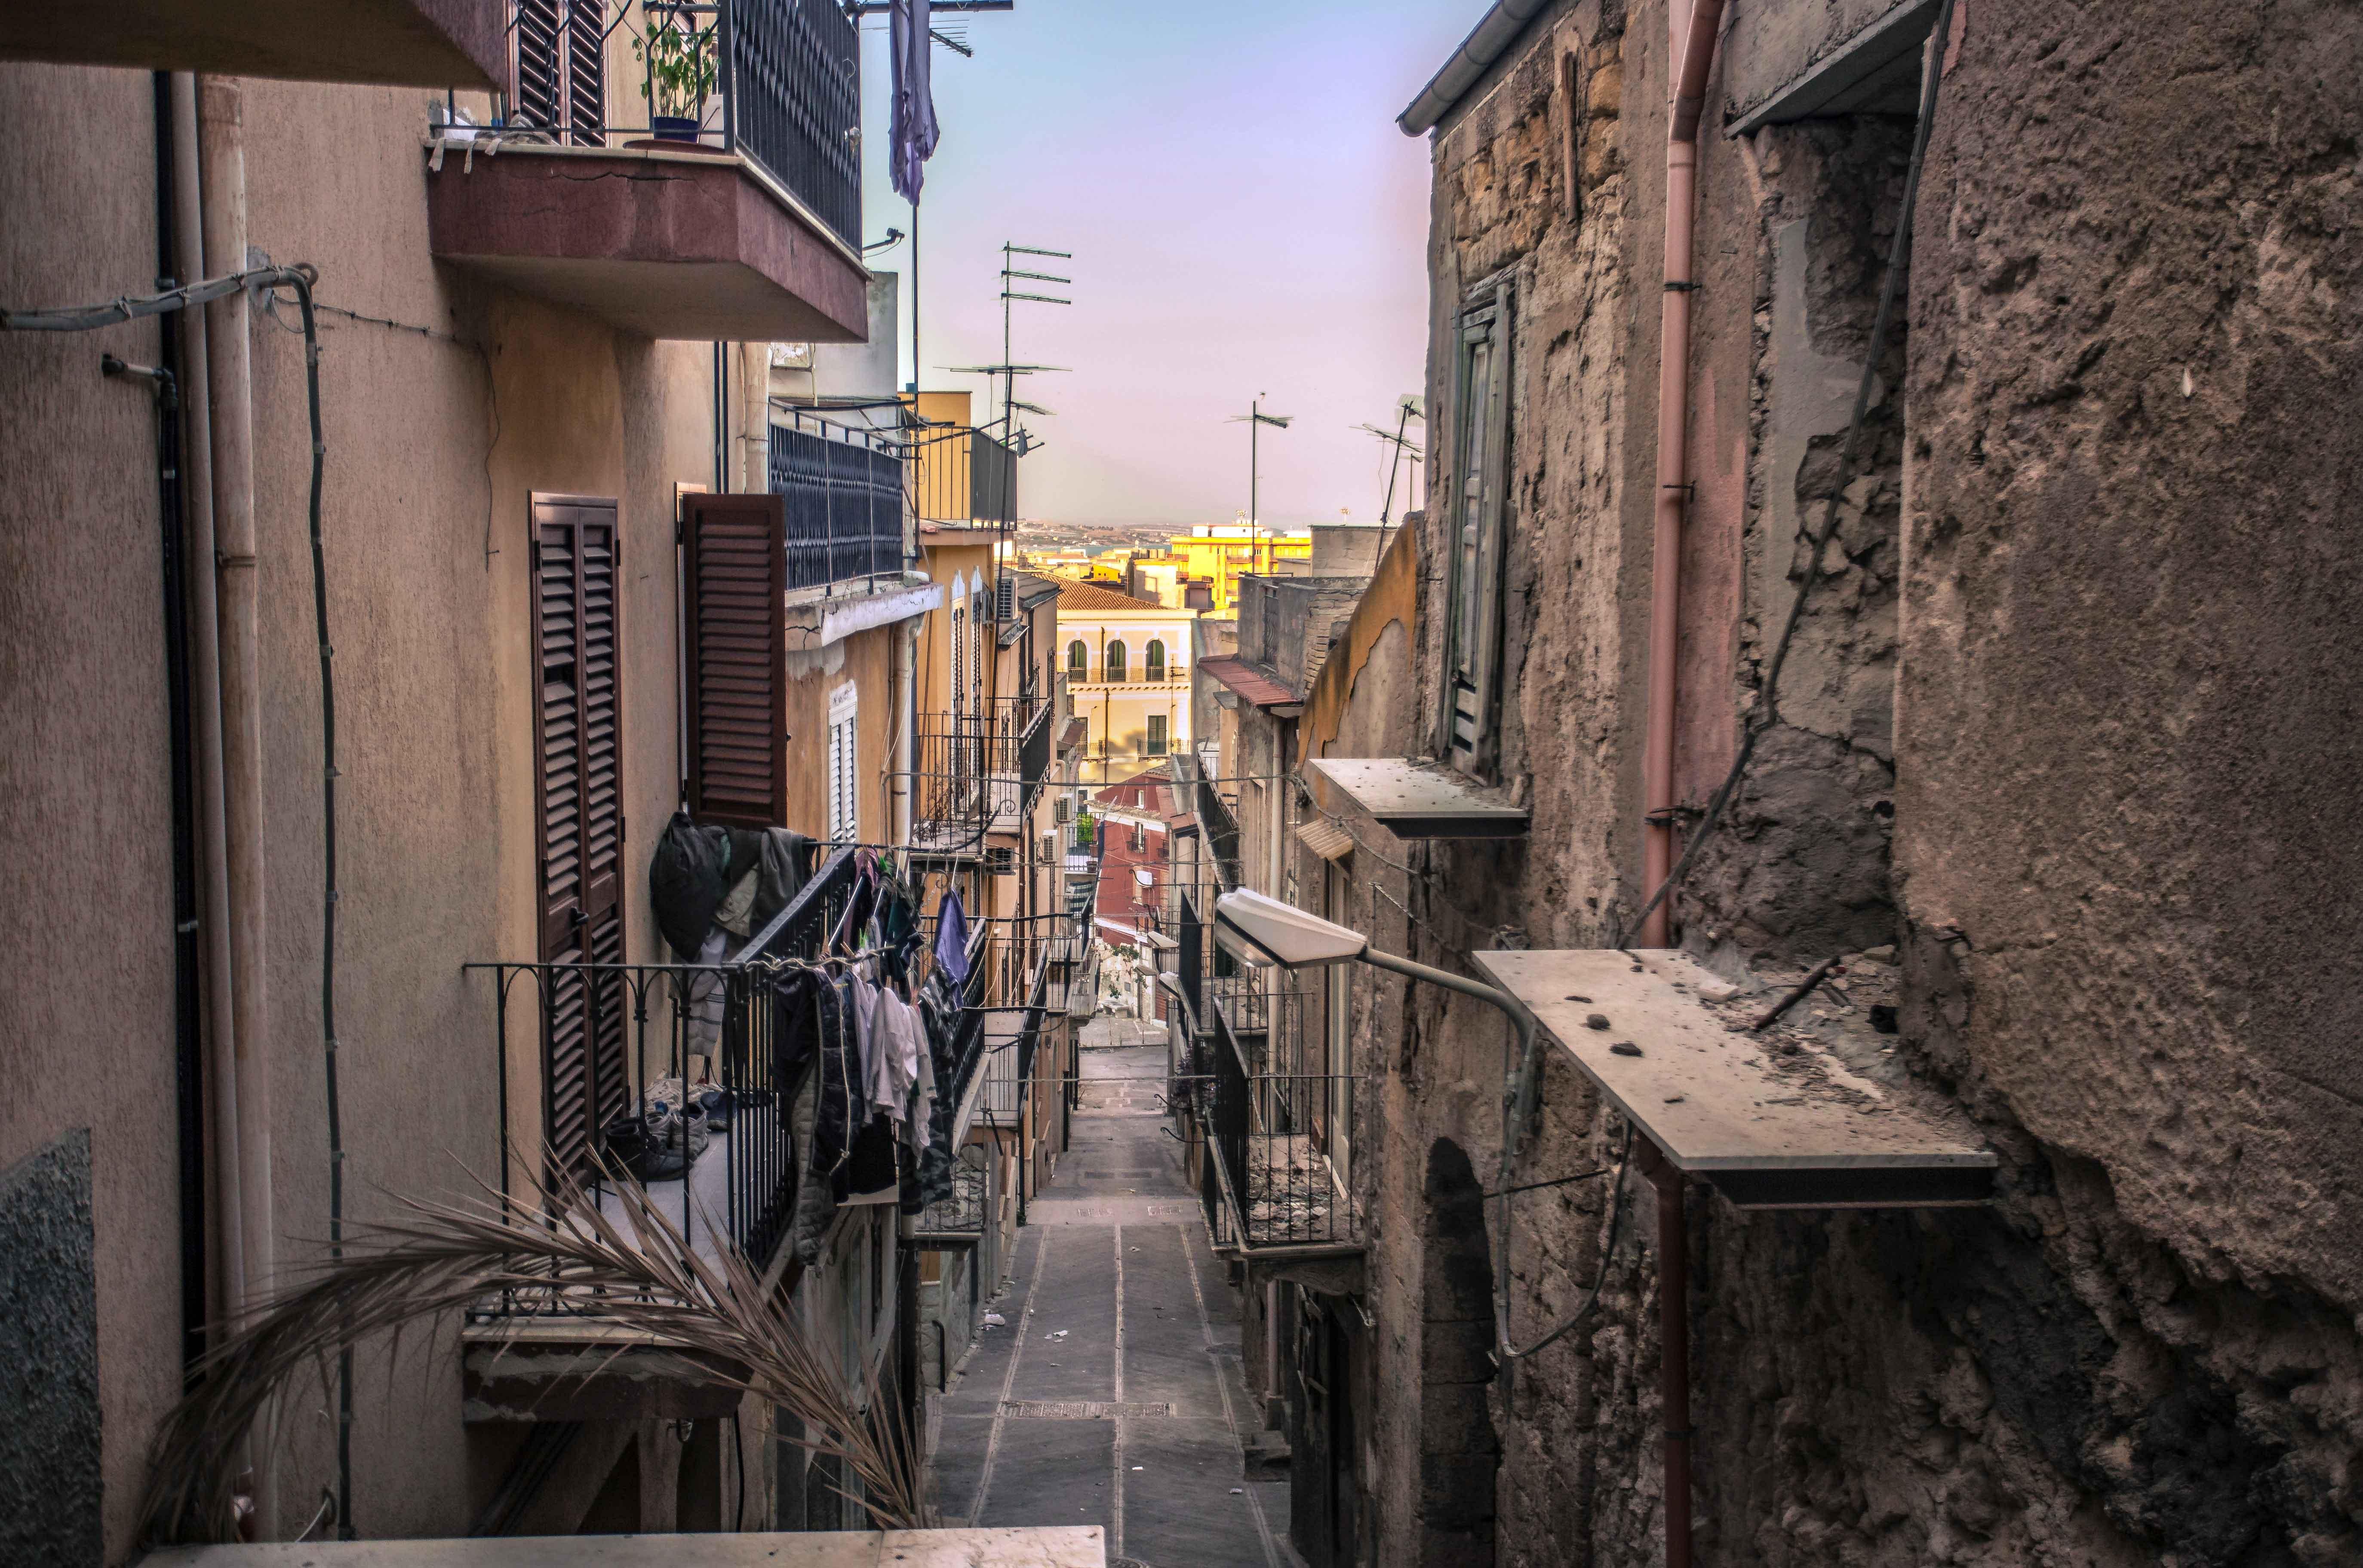 Canva---Characteristic-Alleyway-of-Licata-#4